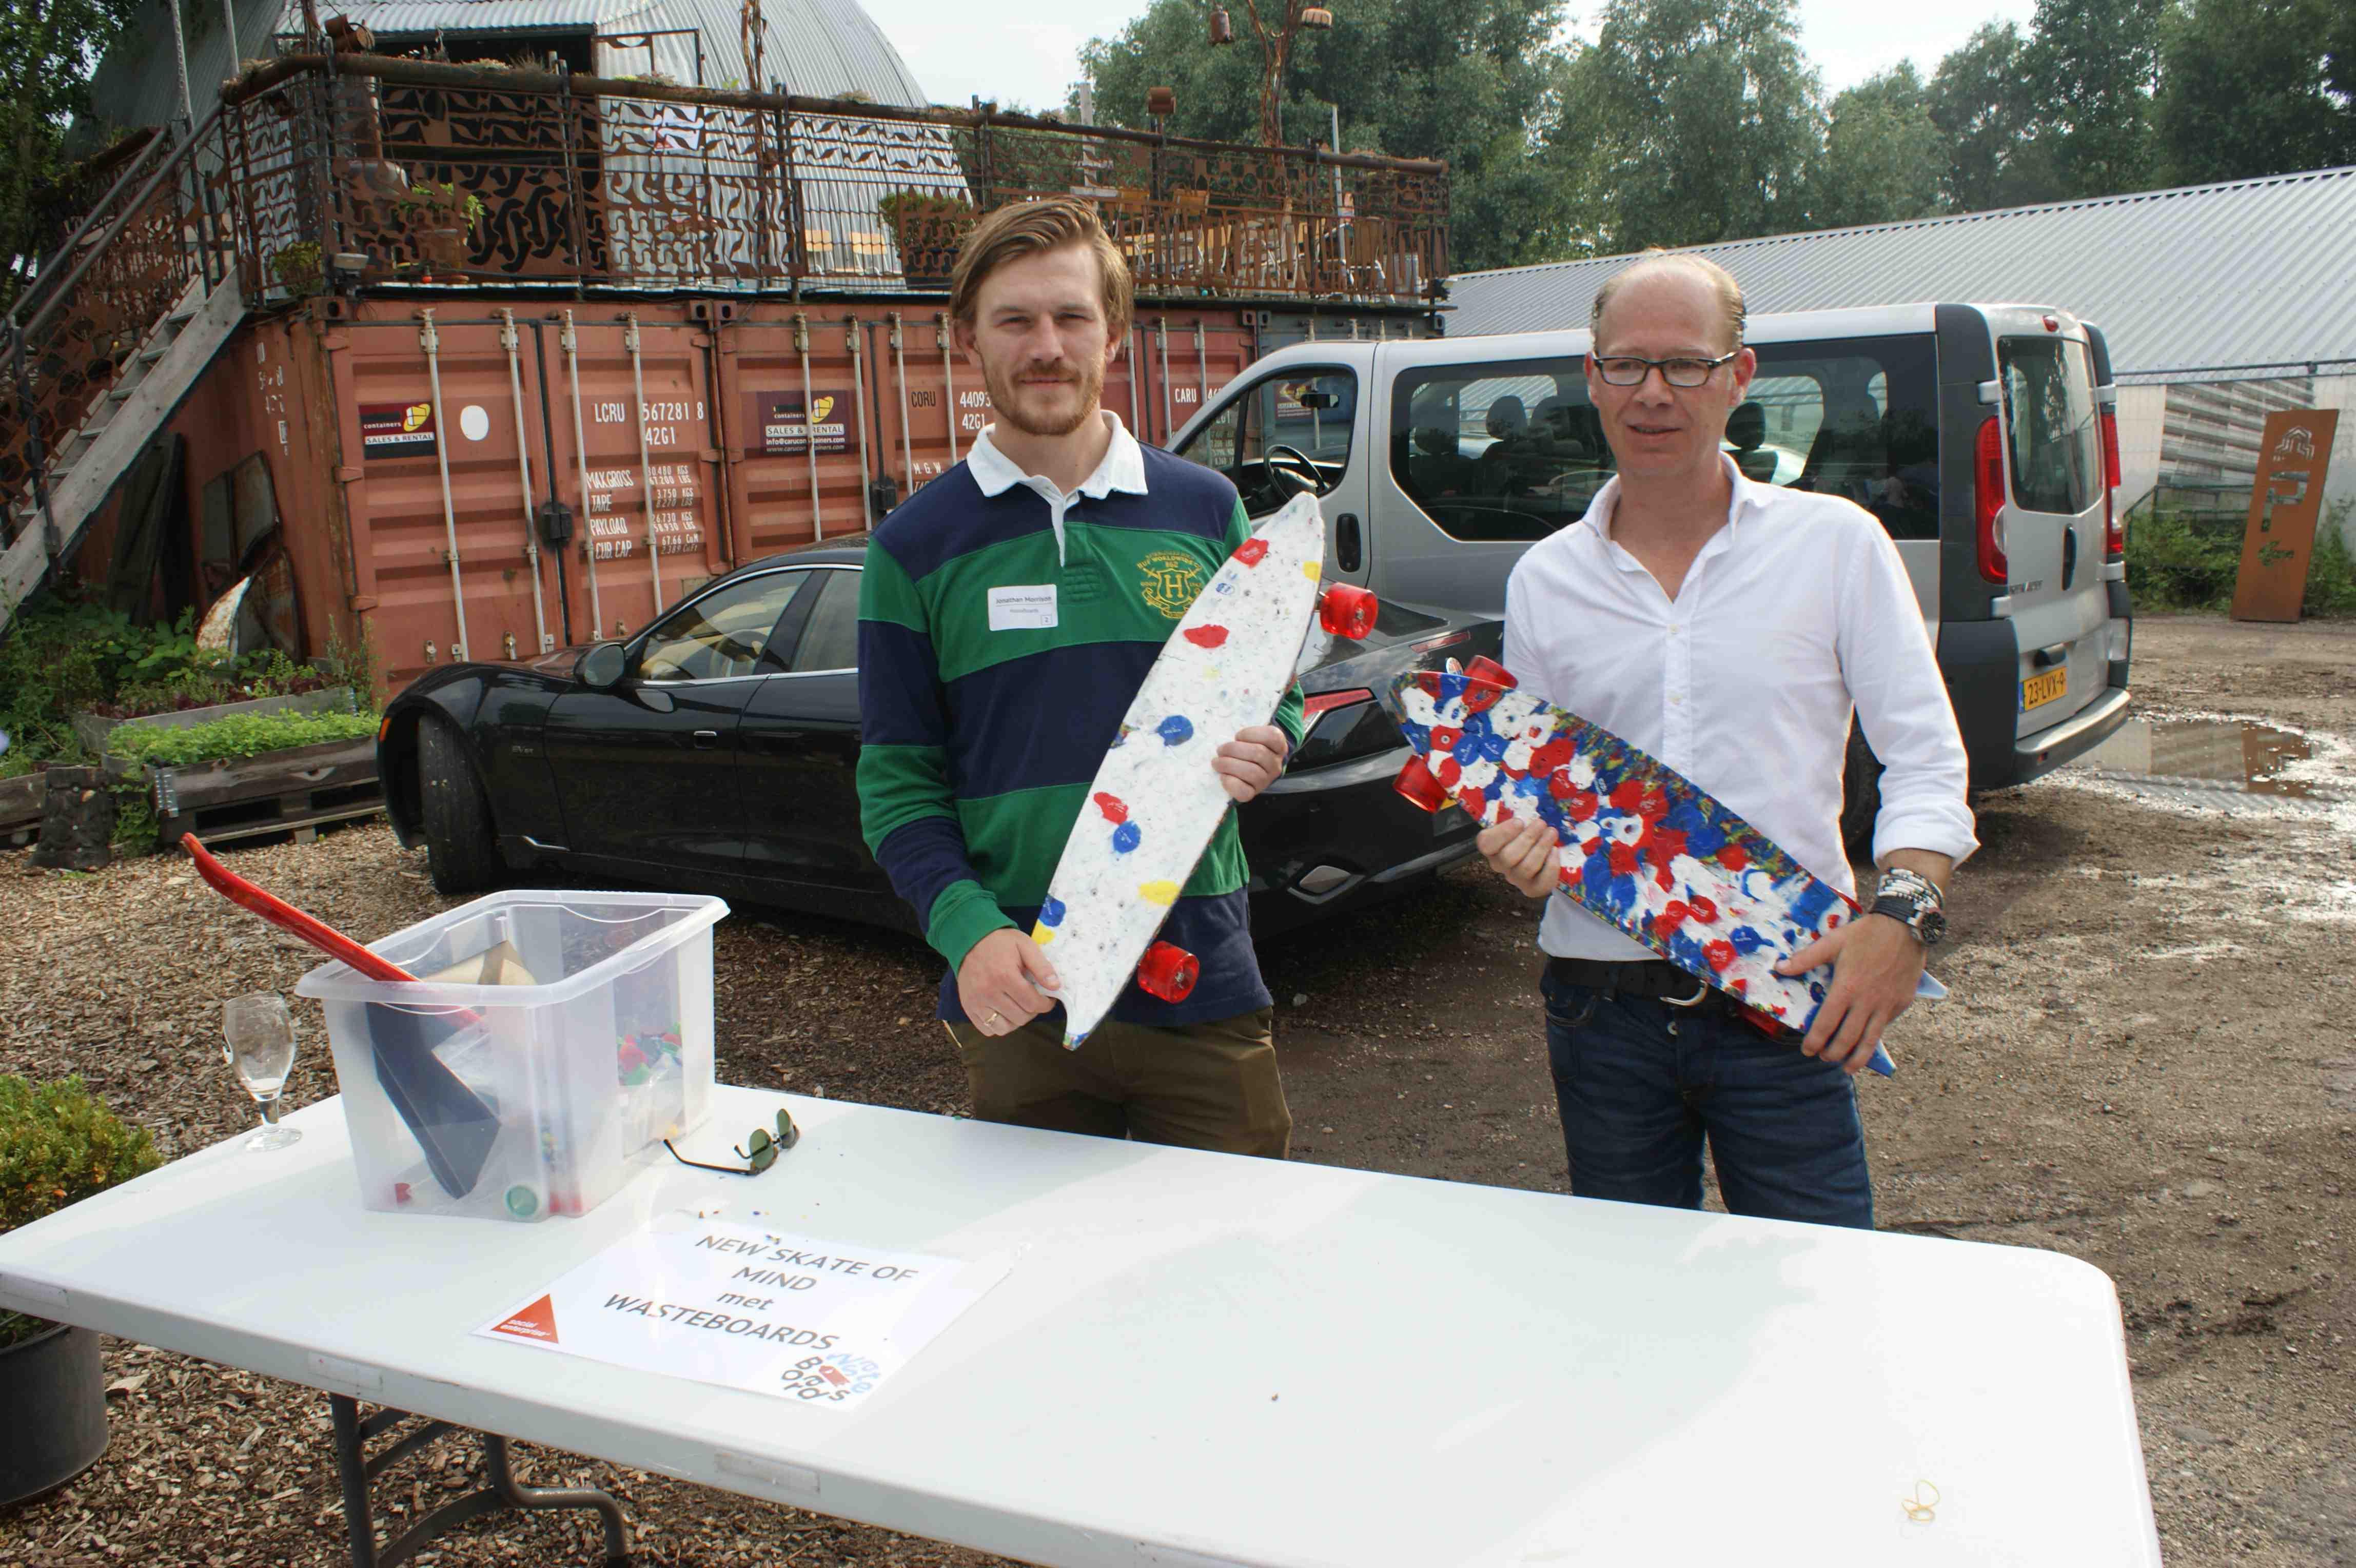 Social enterprise event 2016 6 Wasteboard.jpg